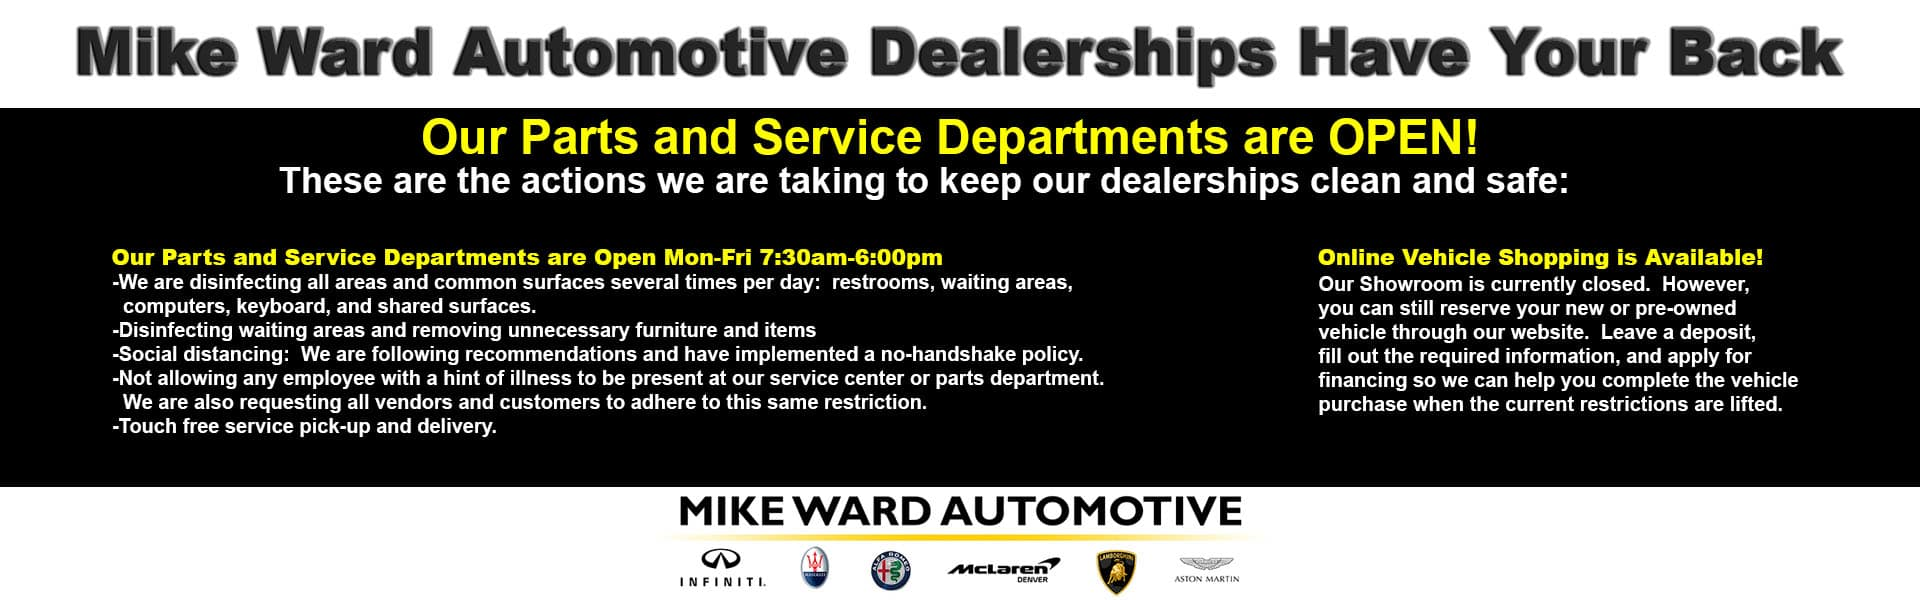 Mike Ward Automotive Dealerships Have Your Back